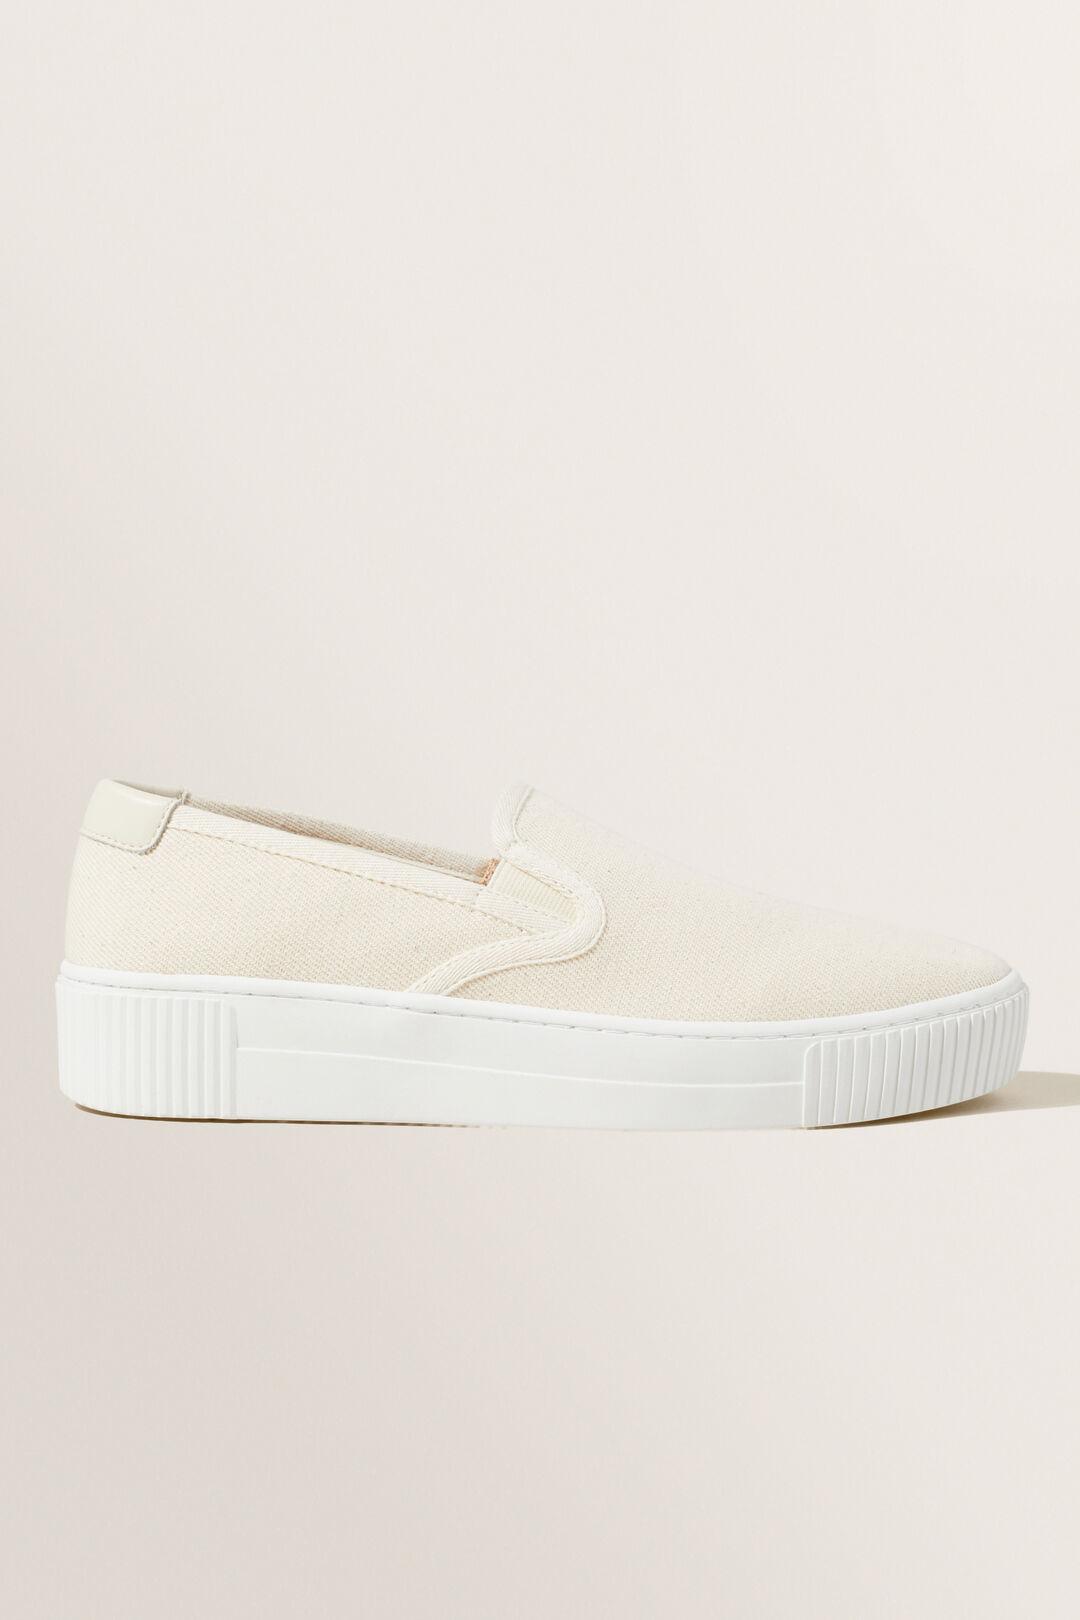 Zoey Slip On Sneaker  Natural  hi-res